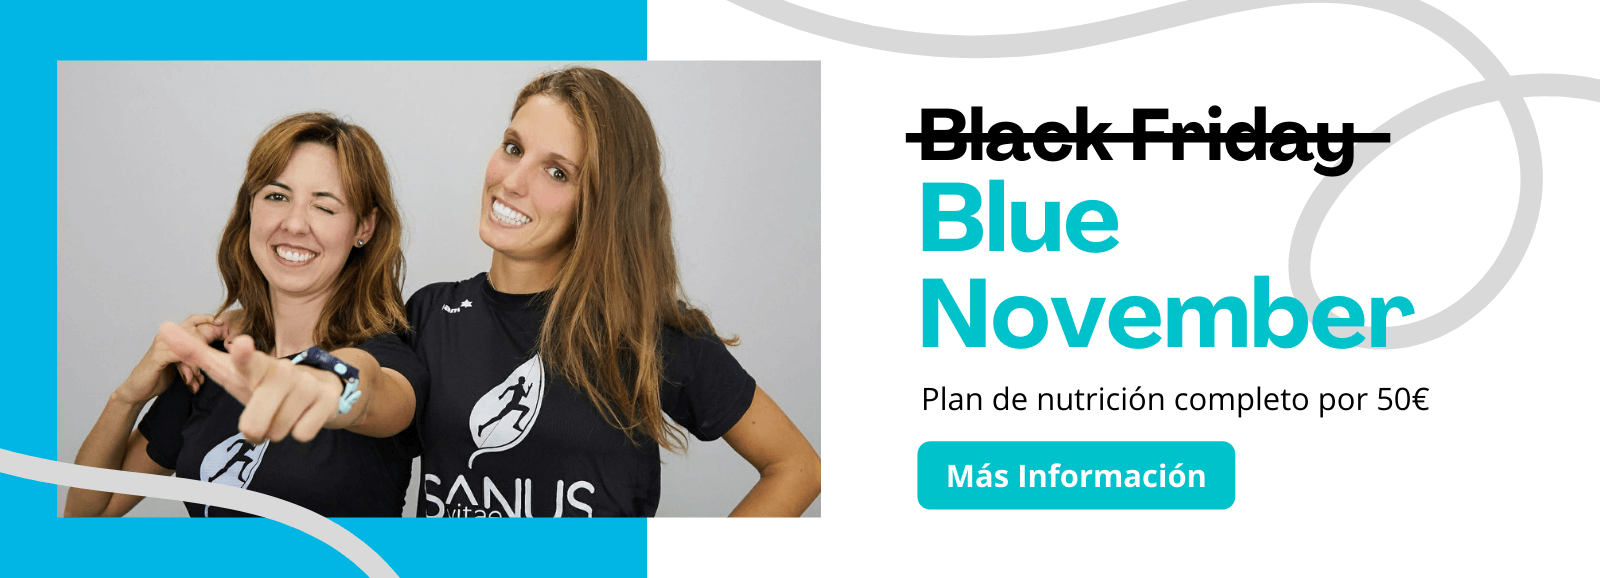 Black Friday Blue November_programa completo de nutricion_banner home